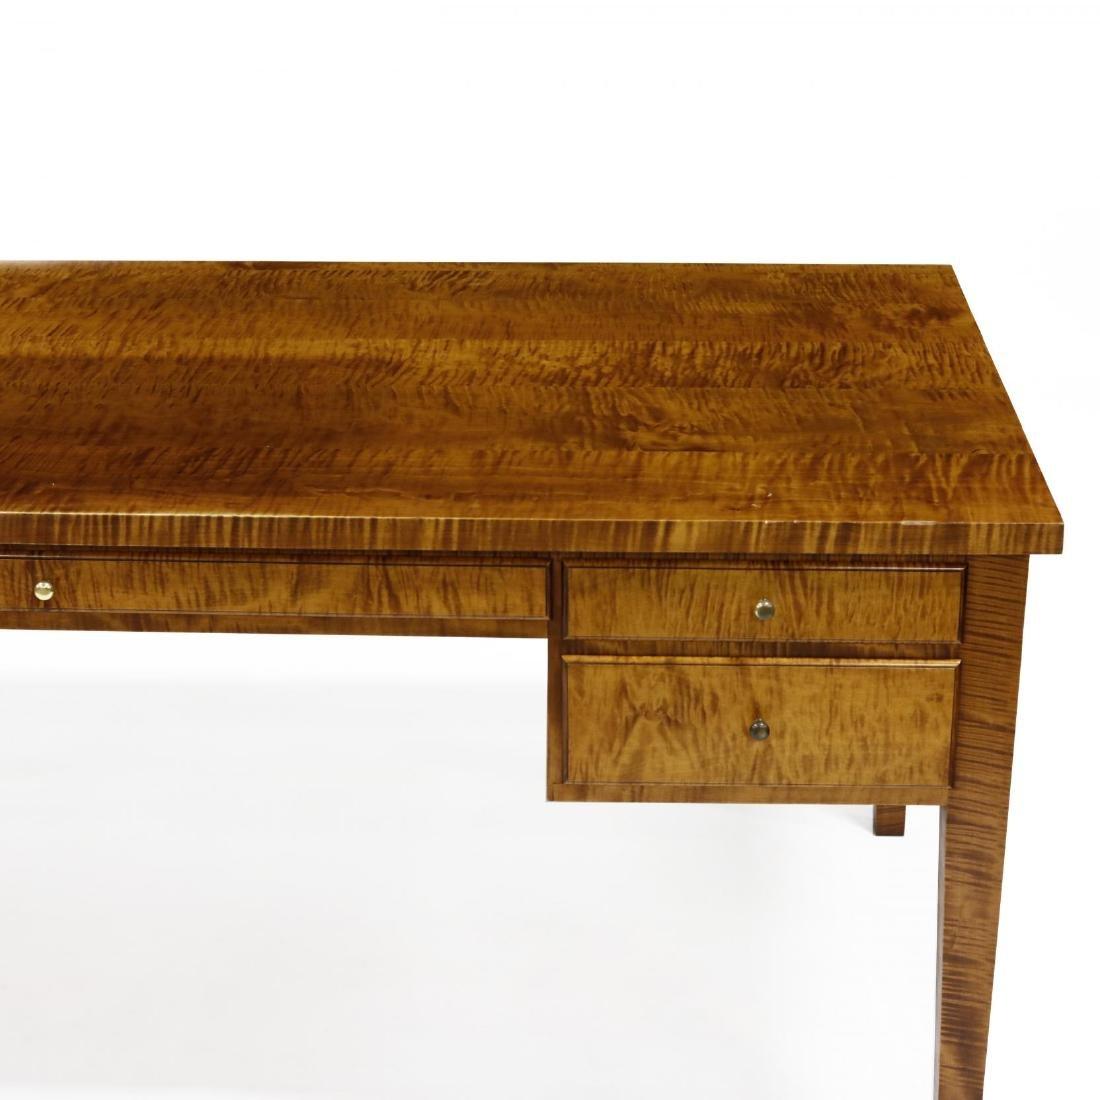 Barton Sharpe, Custom Tiger Maple Executive Desk and - 5